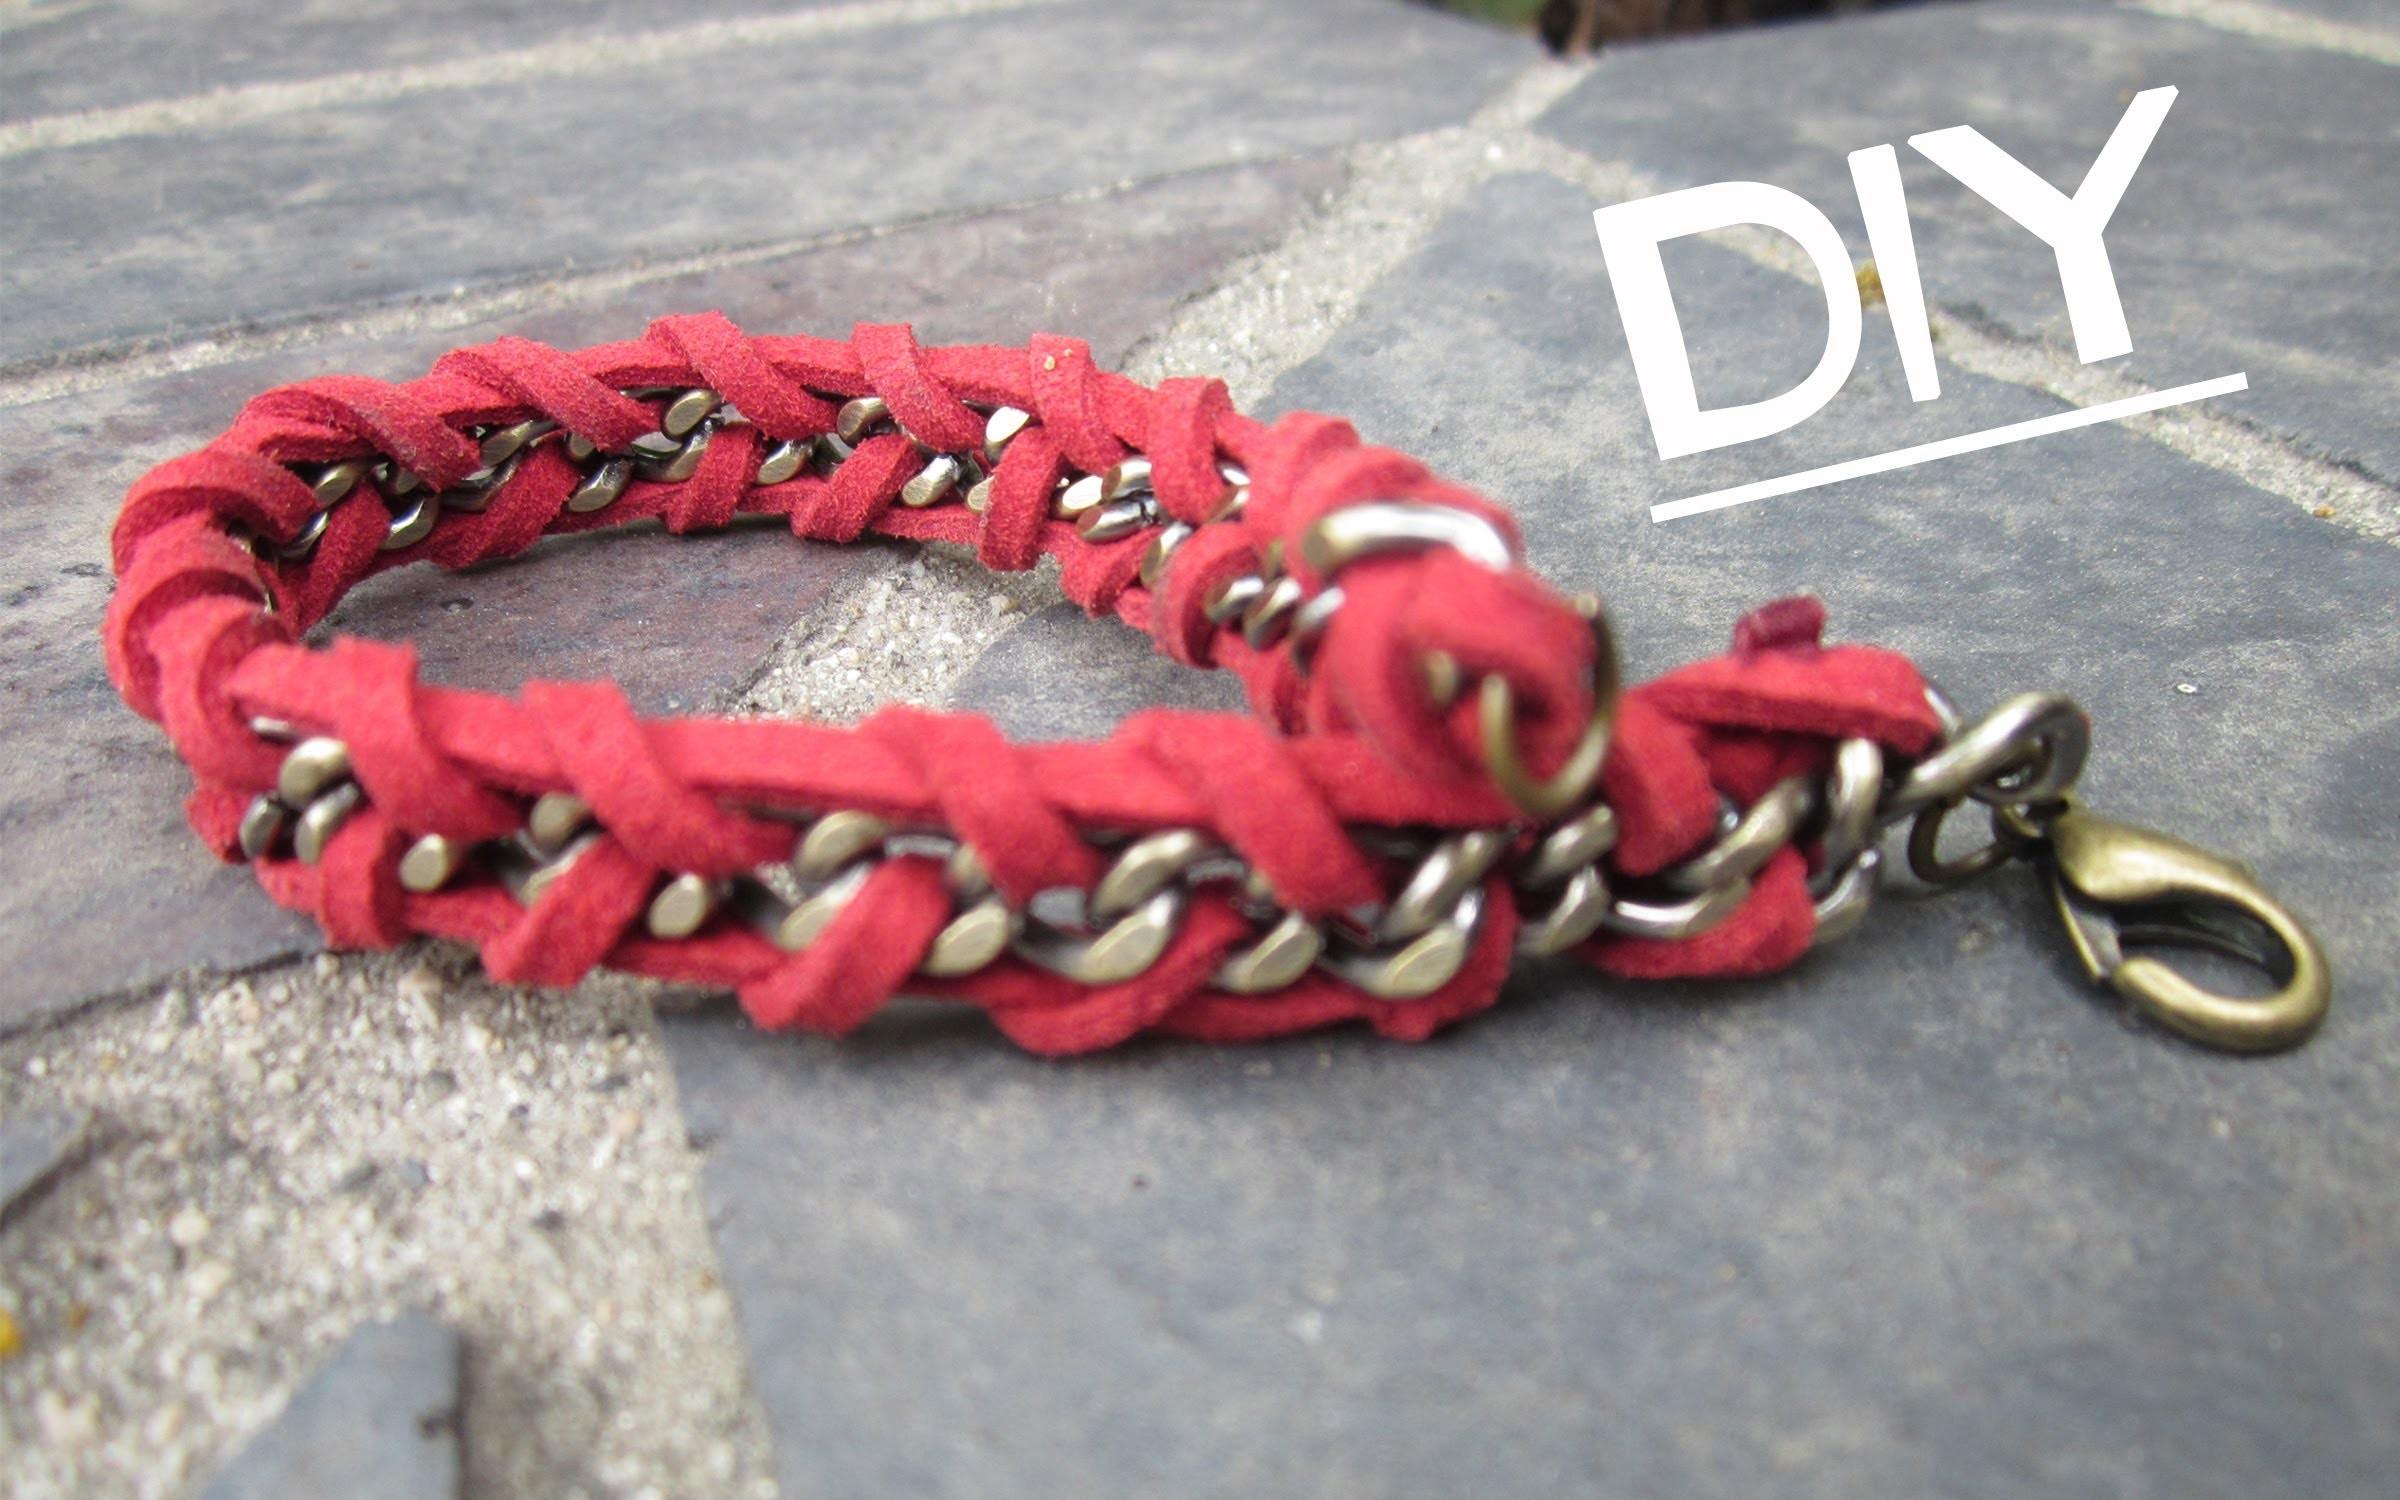 DIY: Chain Wrap Bracelet